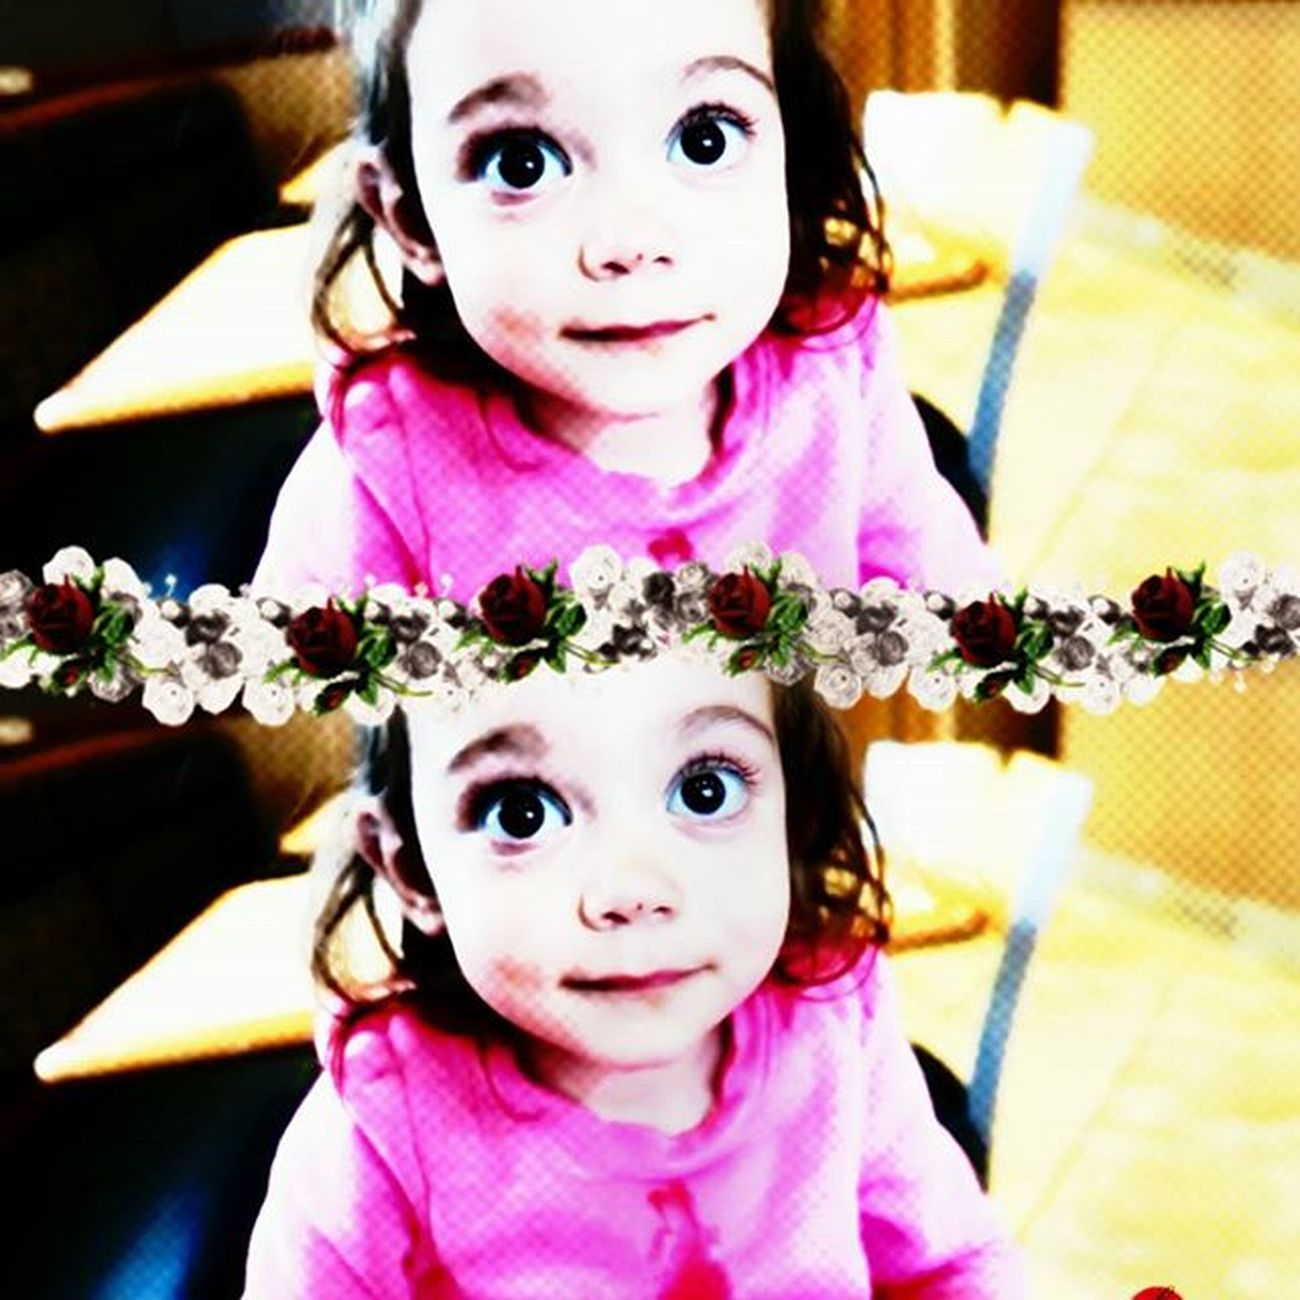 "VOVÓ JANETE CURTIU 💜 ""7 bilion smiles, and yours is my favorite"" 💜 @flavia_calina_ @ricardocalina @janetevalle @fenascimento11 @rodrigo_kiko88 @rosatosto Amor Vi BabyV Linda Smiles Favorite Paixão Perfeita"